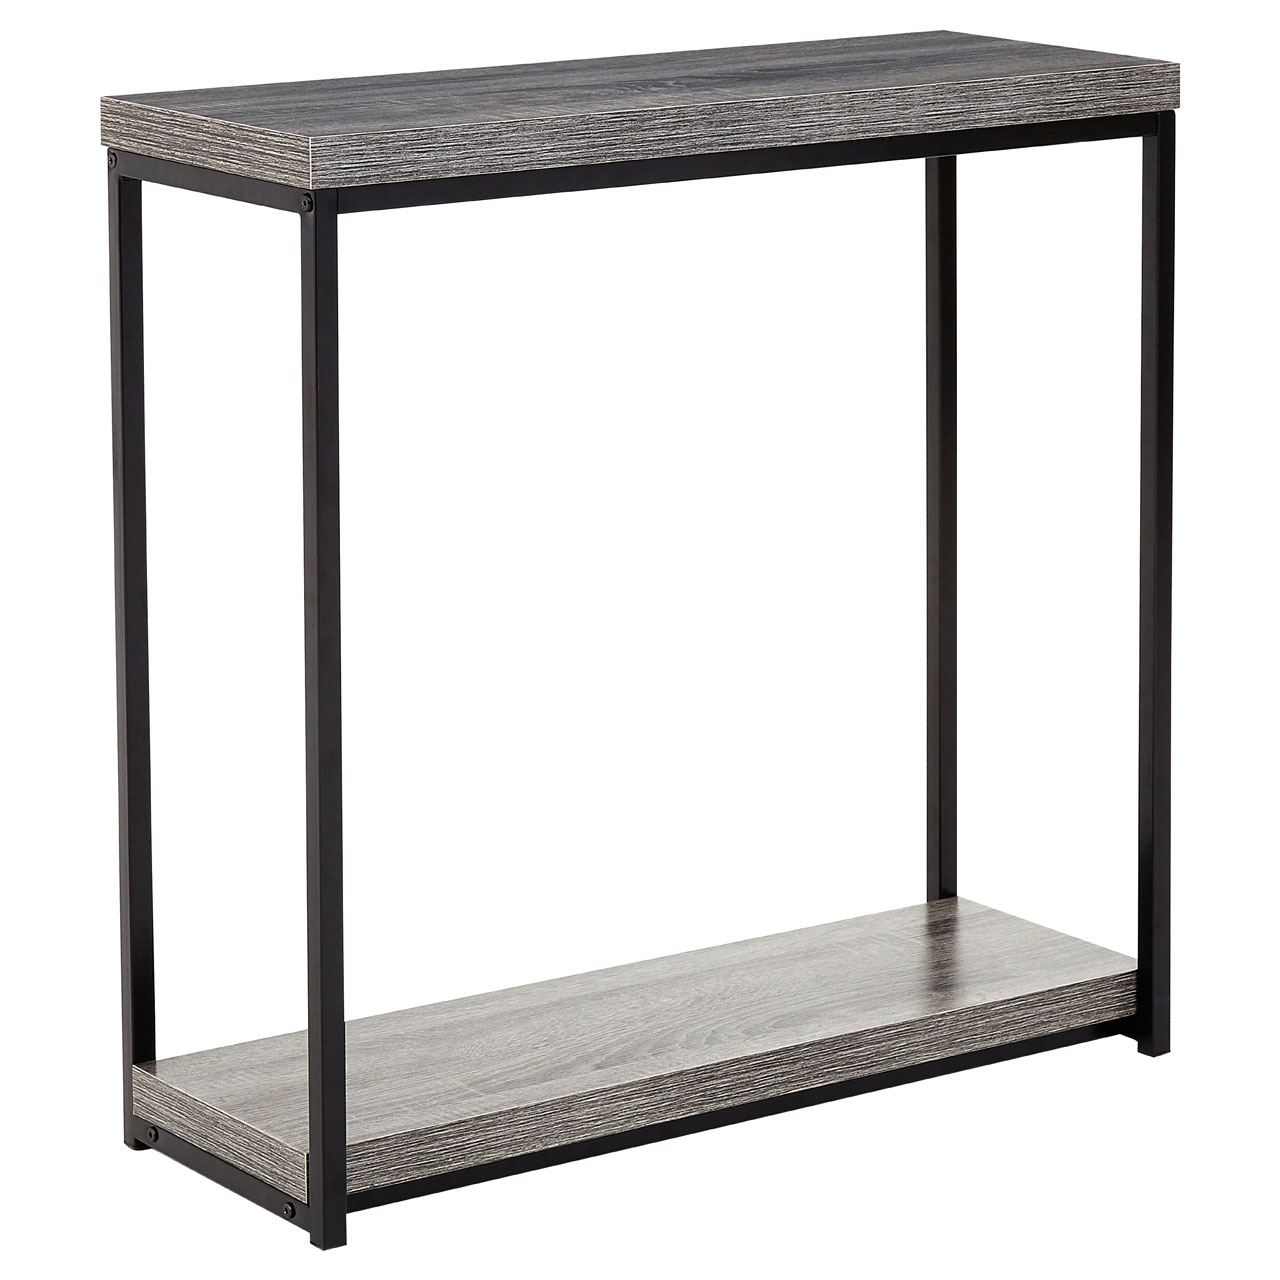 Metal Sofa Table Ohiowoodlands Sofa Table Base Solid Steel